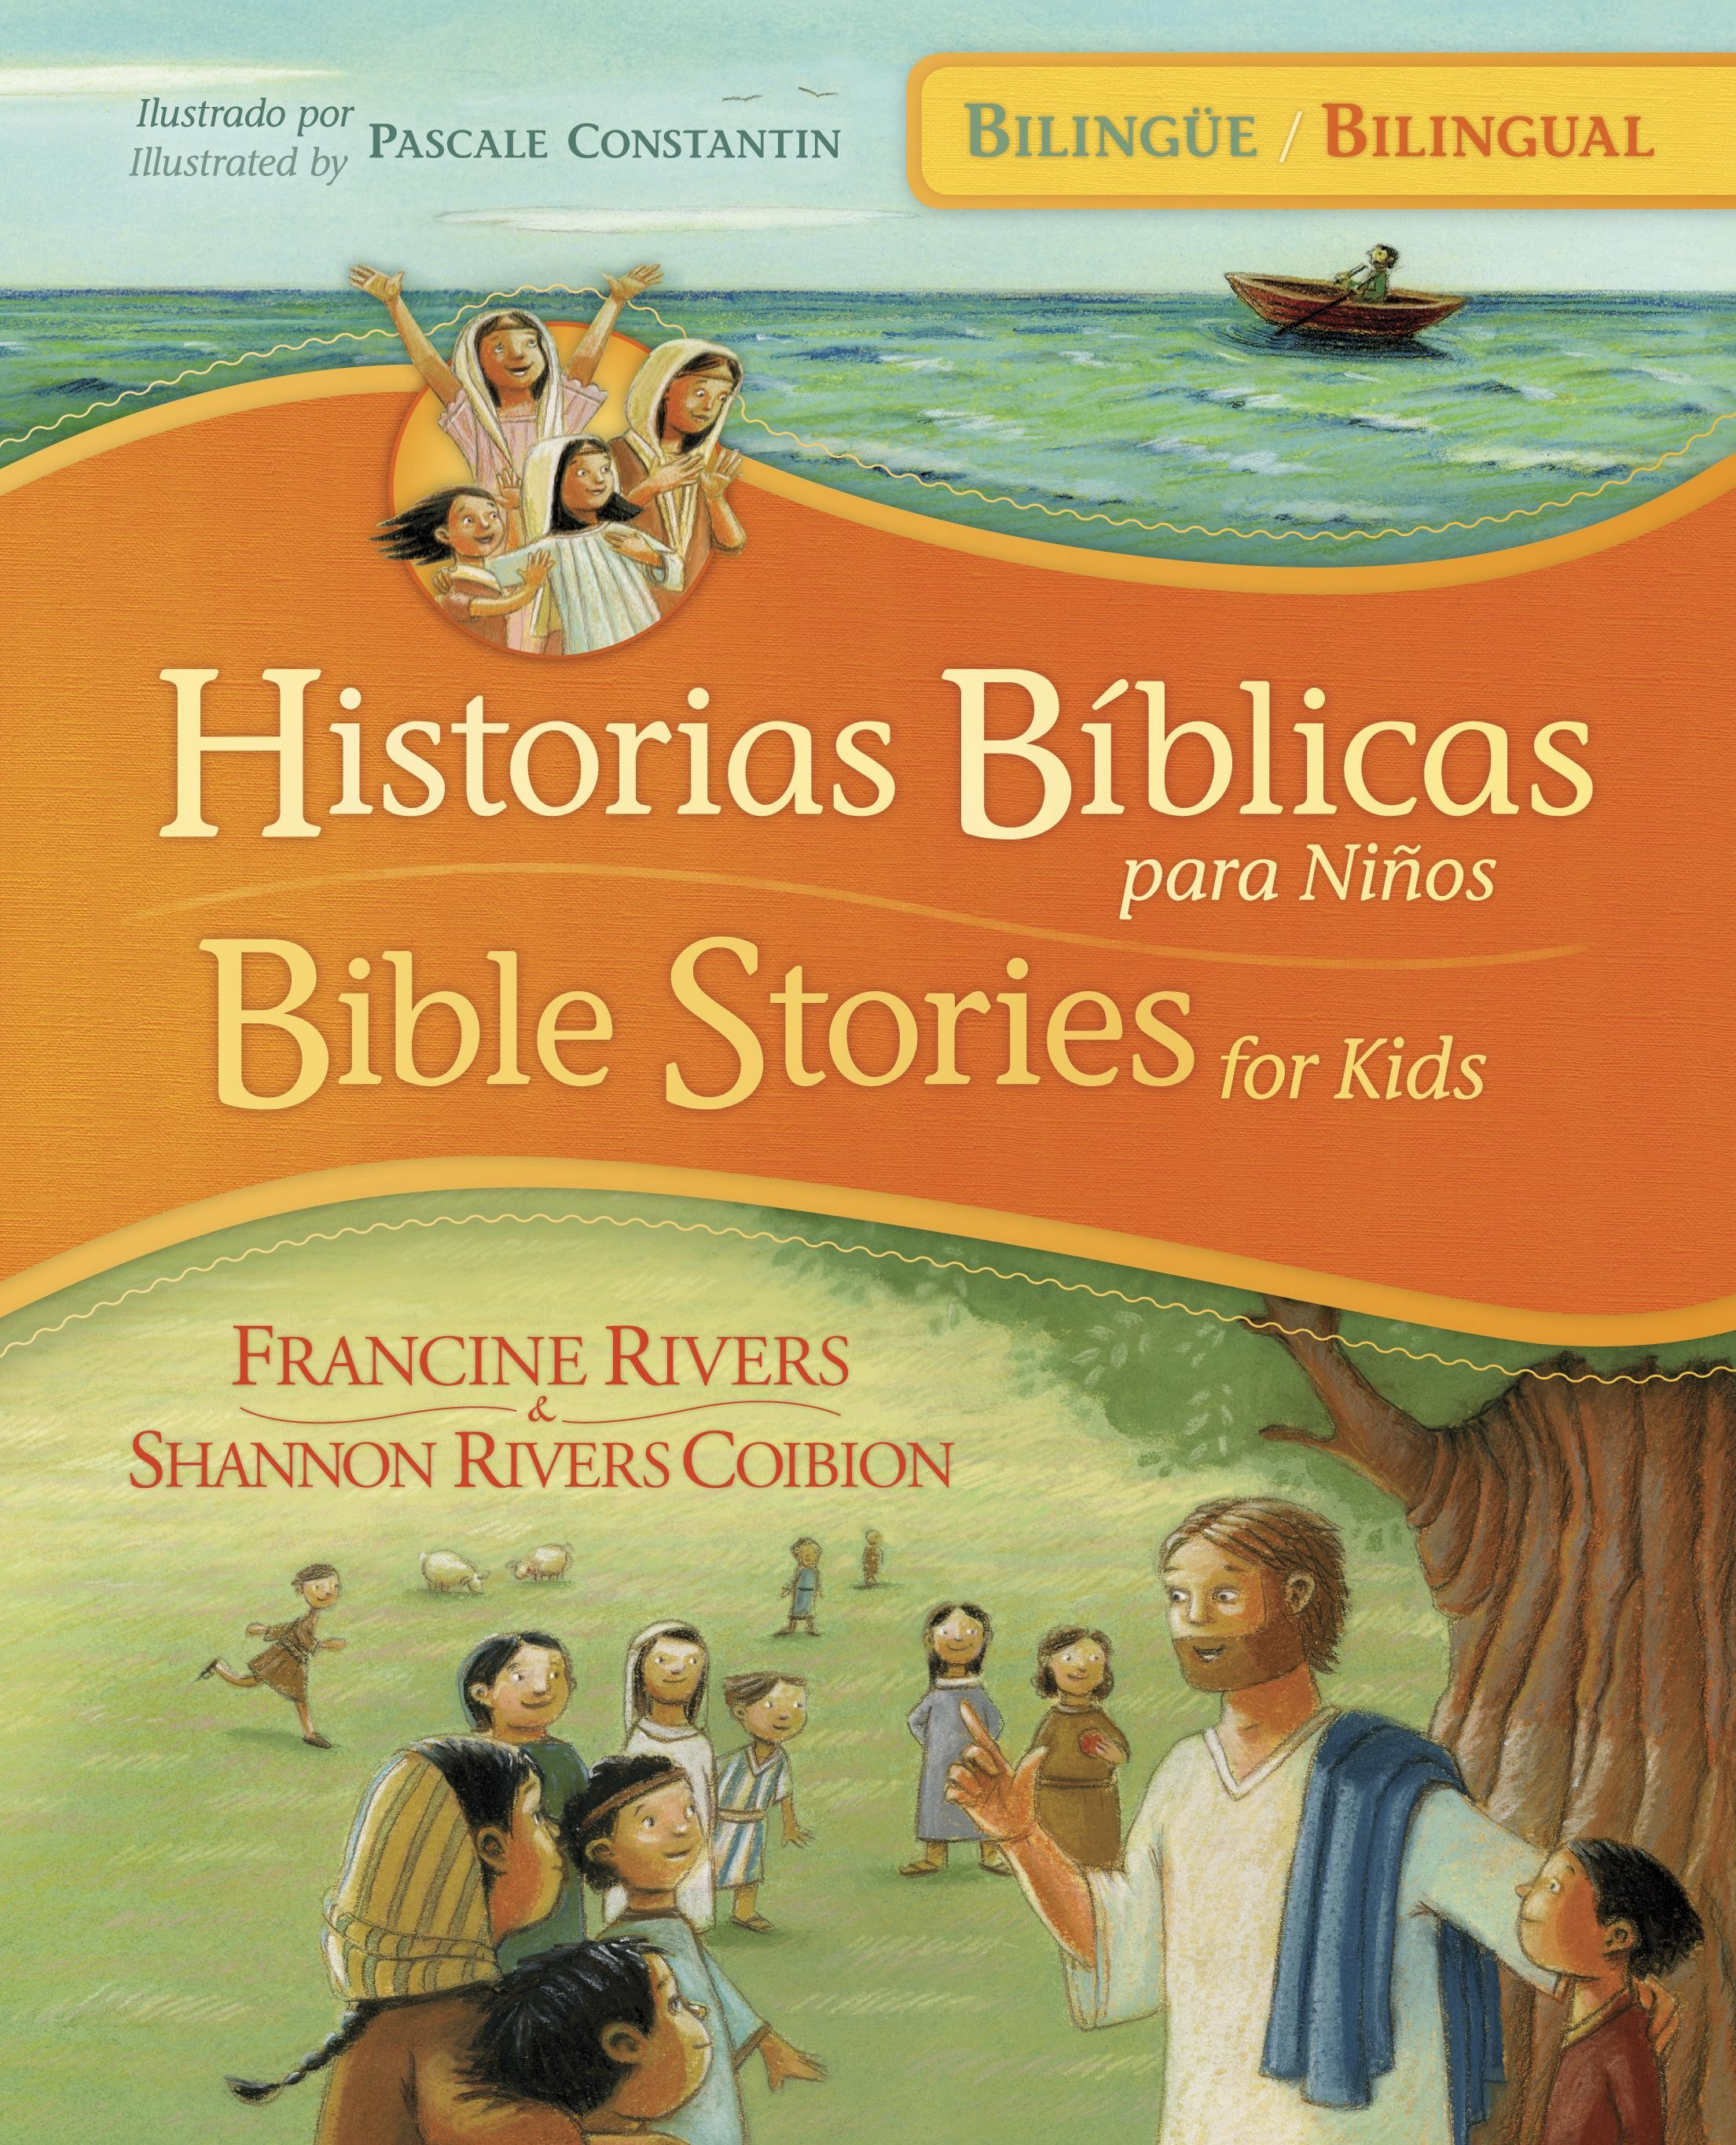 Historias bíblicas para niños / Bible Stories for Kids (bilingüe / bilingual)